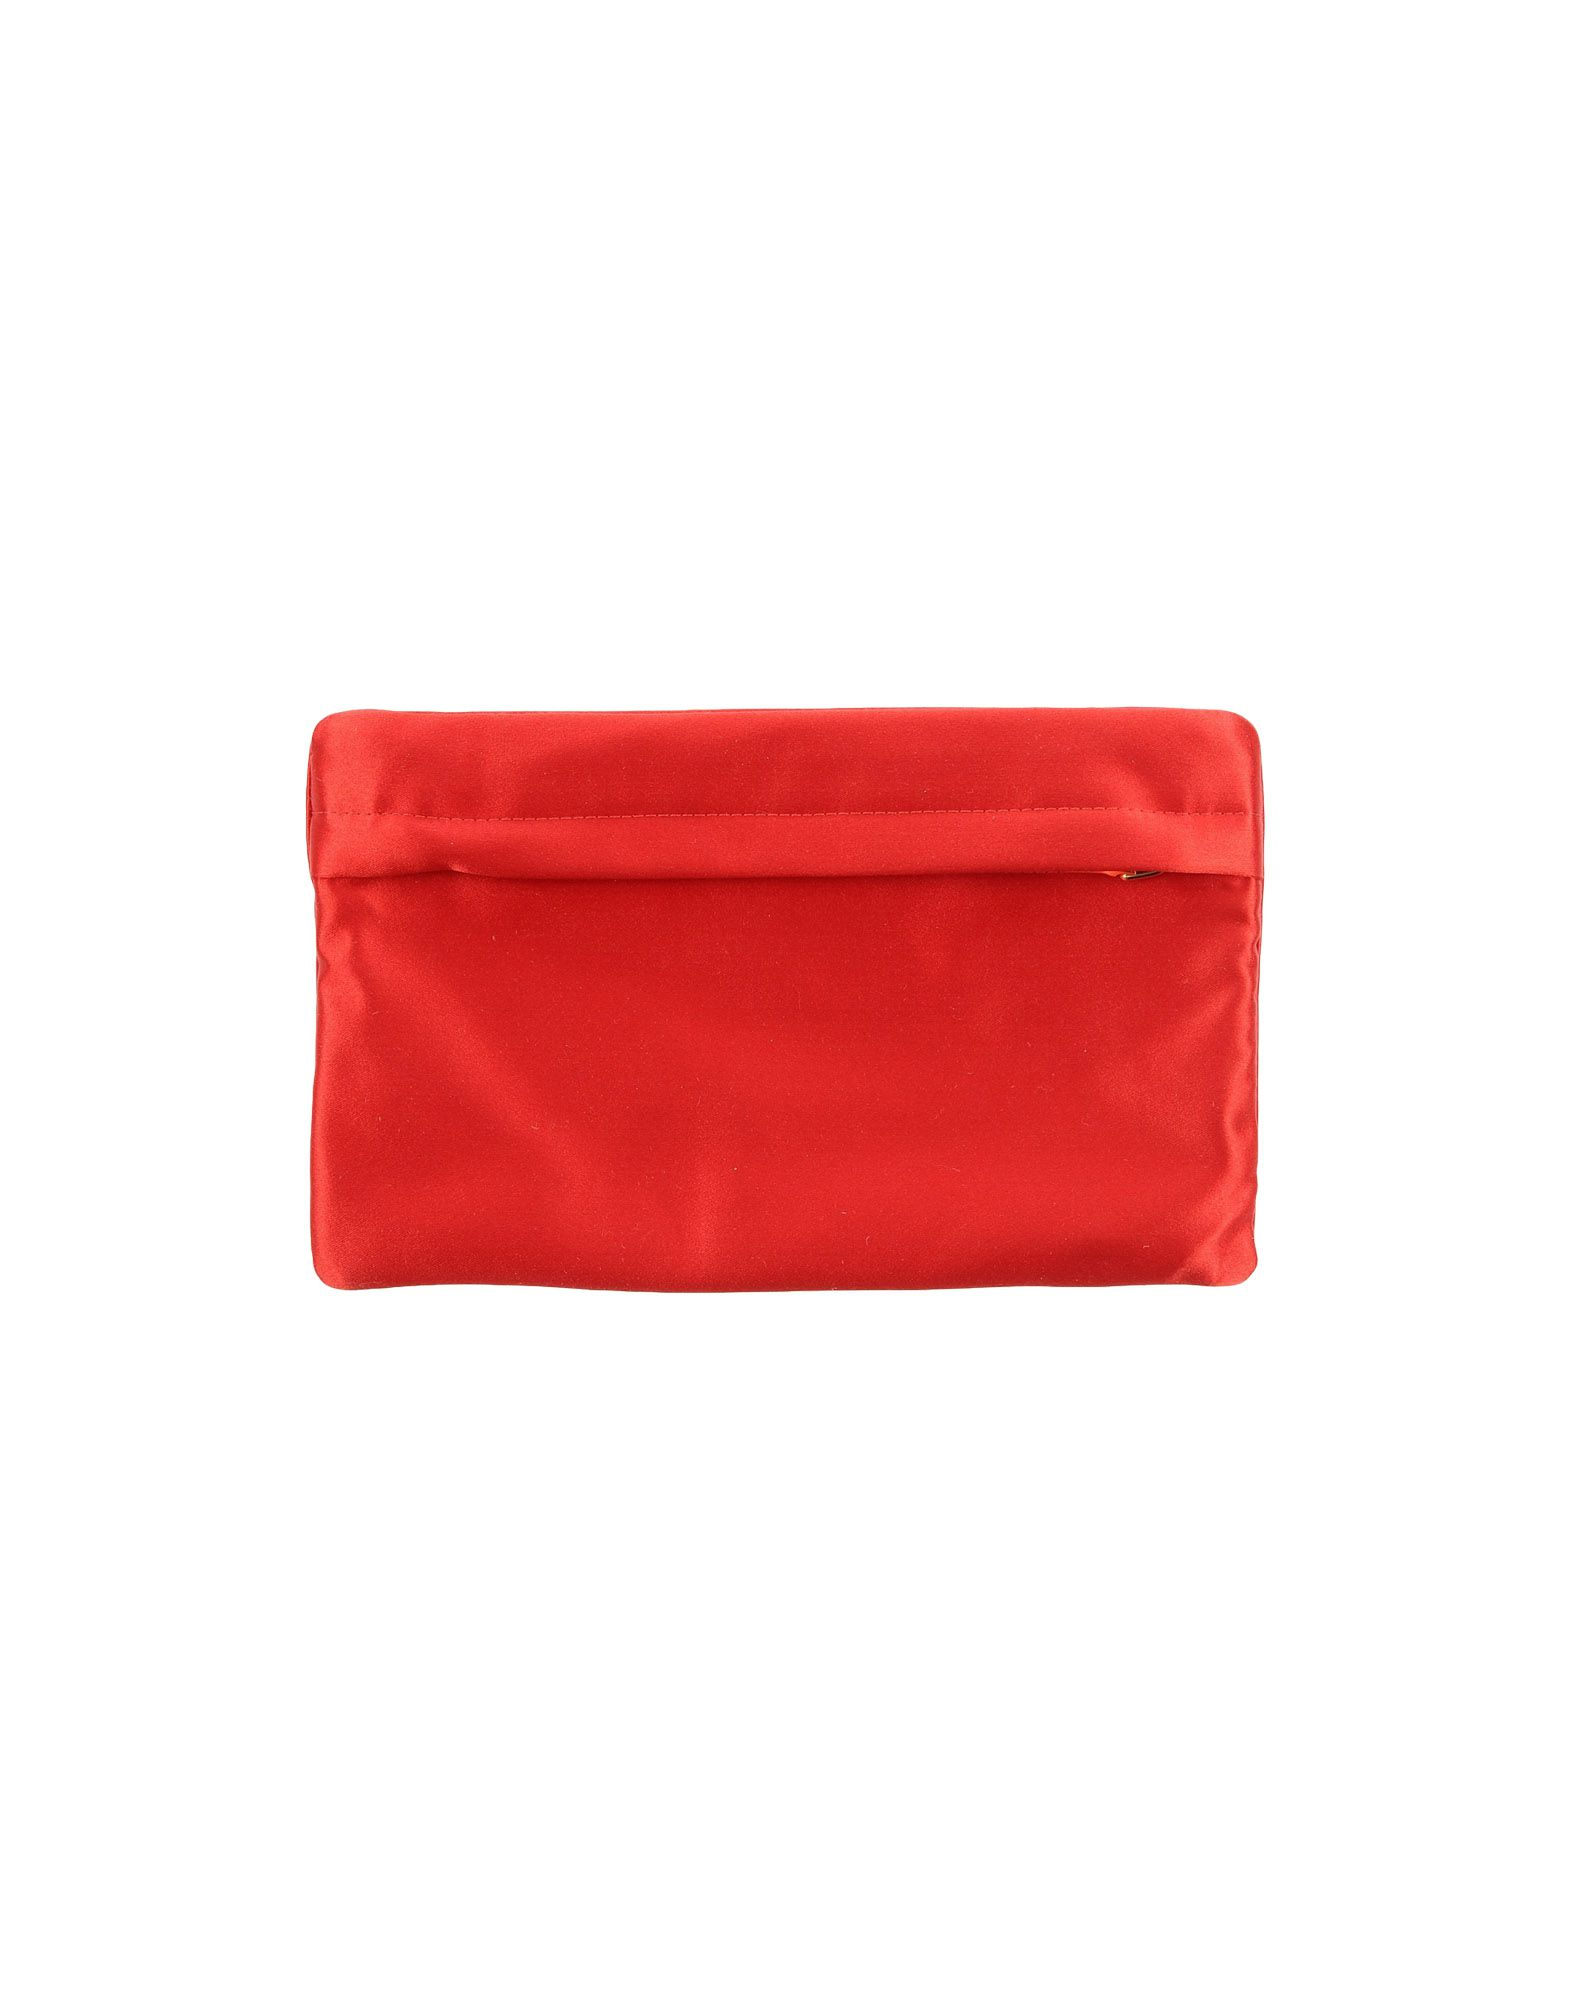 6f84c157cf17 プラダ(PRADA) セカンドバッグ | 通販・人気ランキング - 価格.com